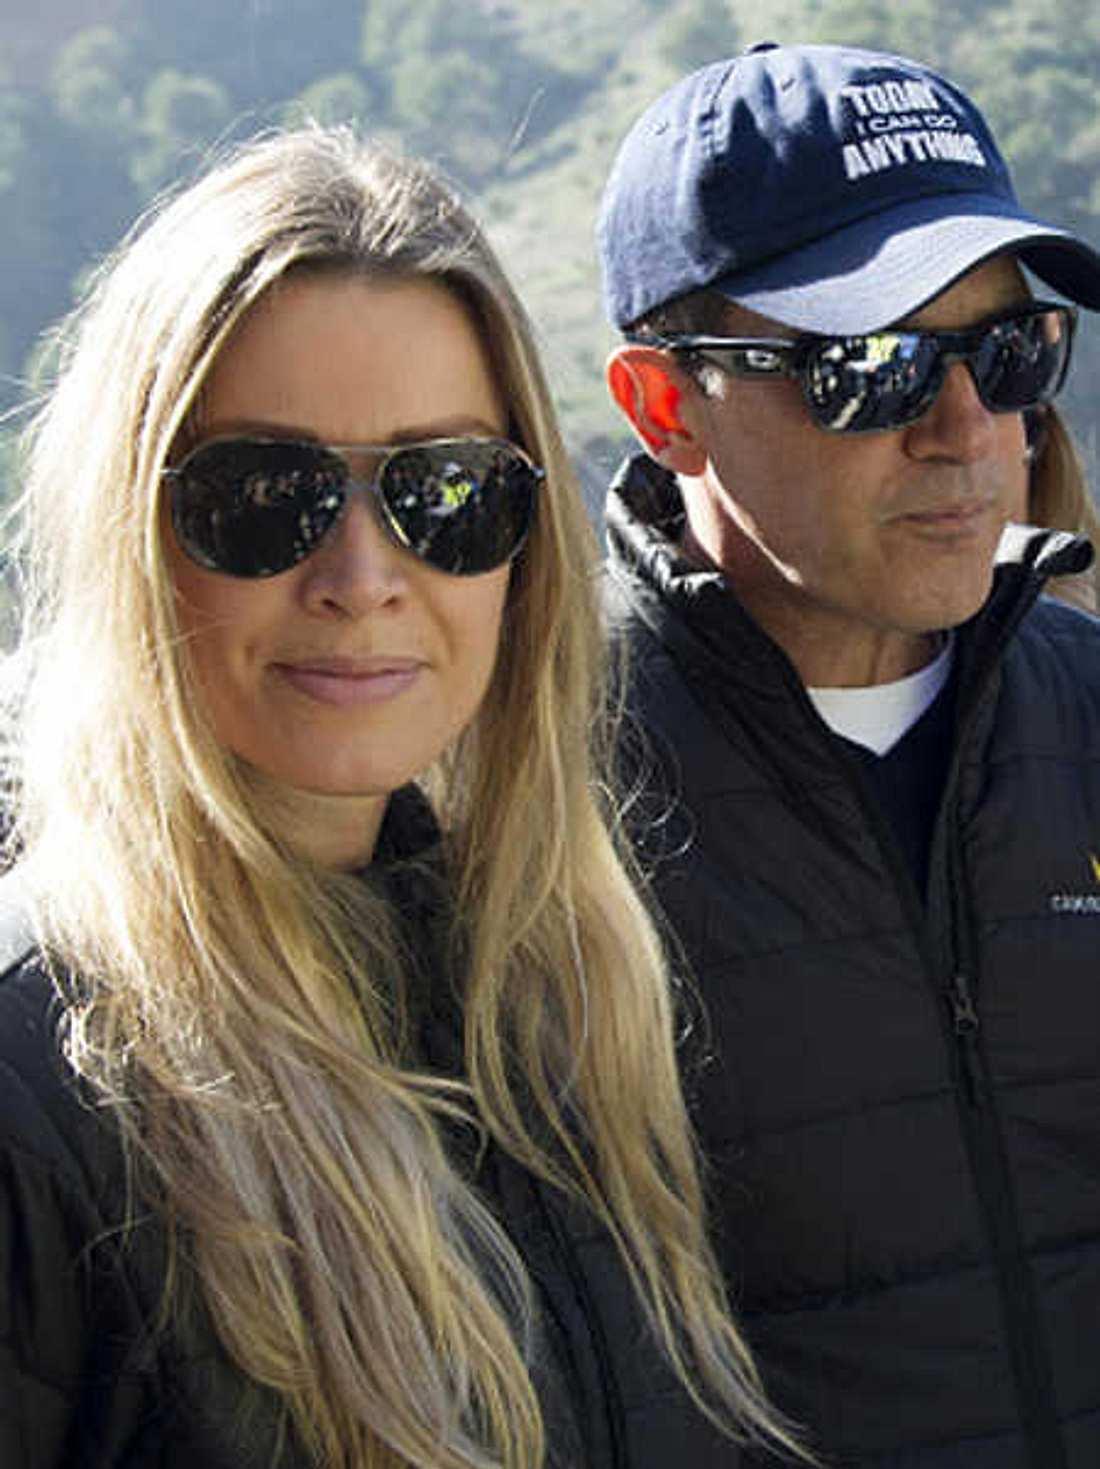 Antonio Banderas: Nicole Kempel ist seine neue Freundin